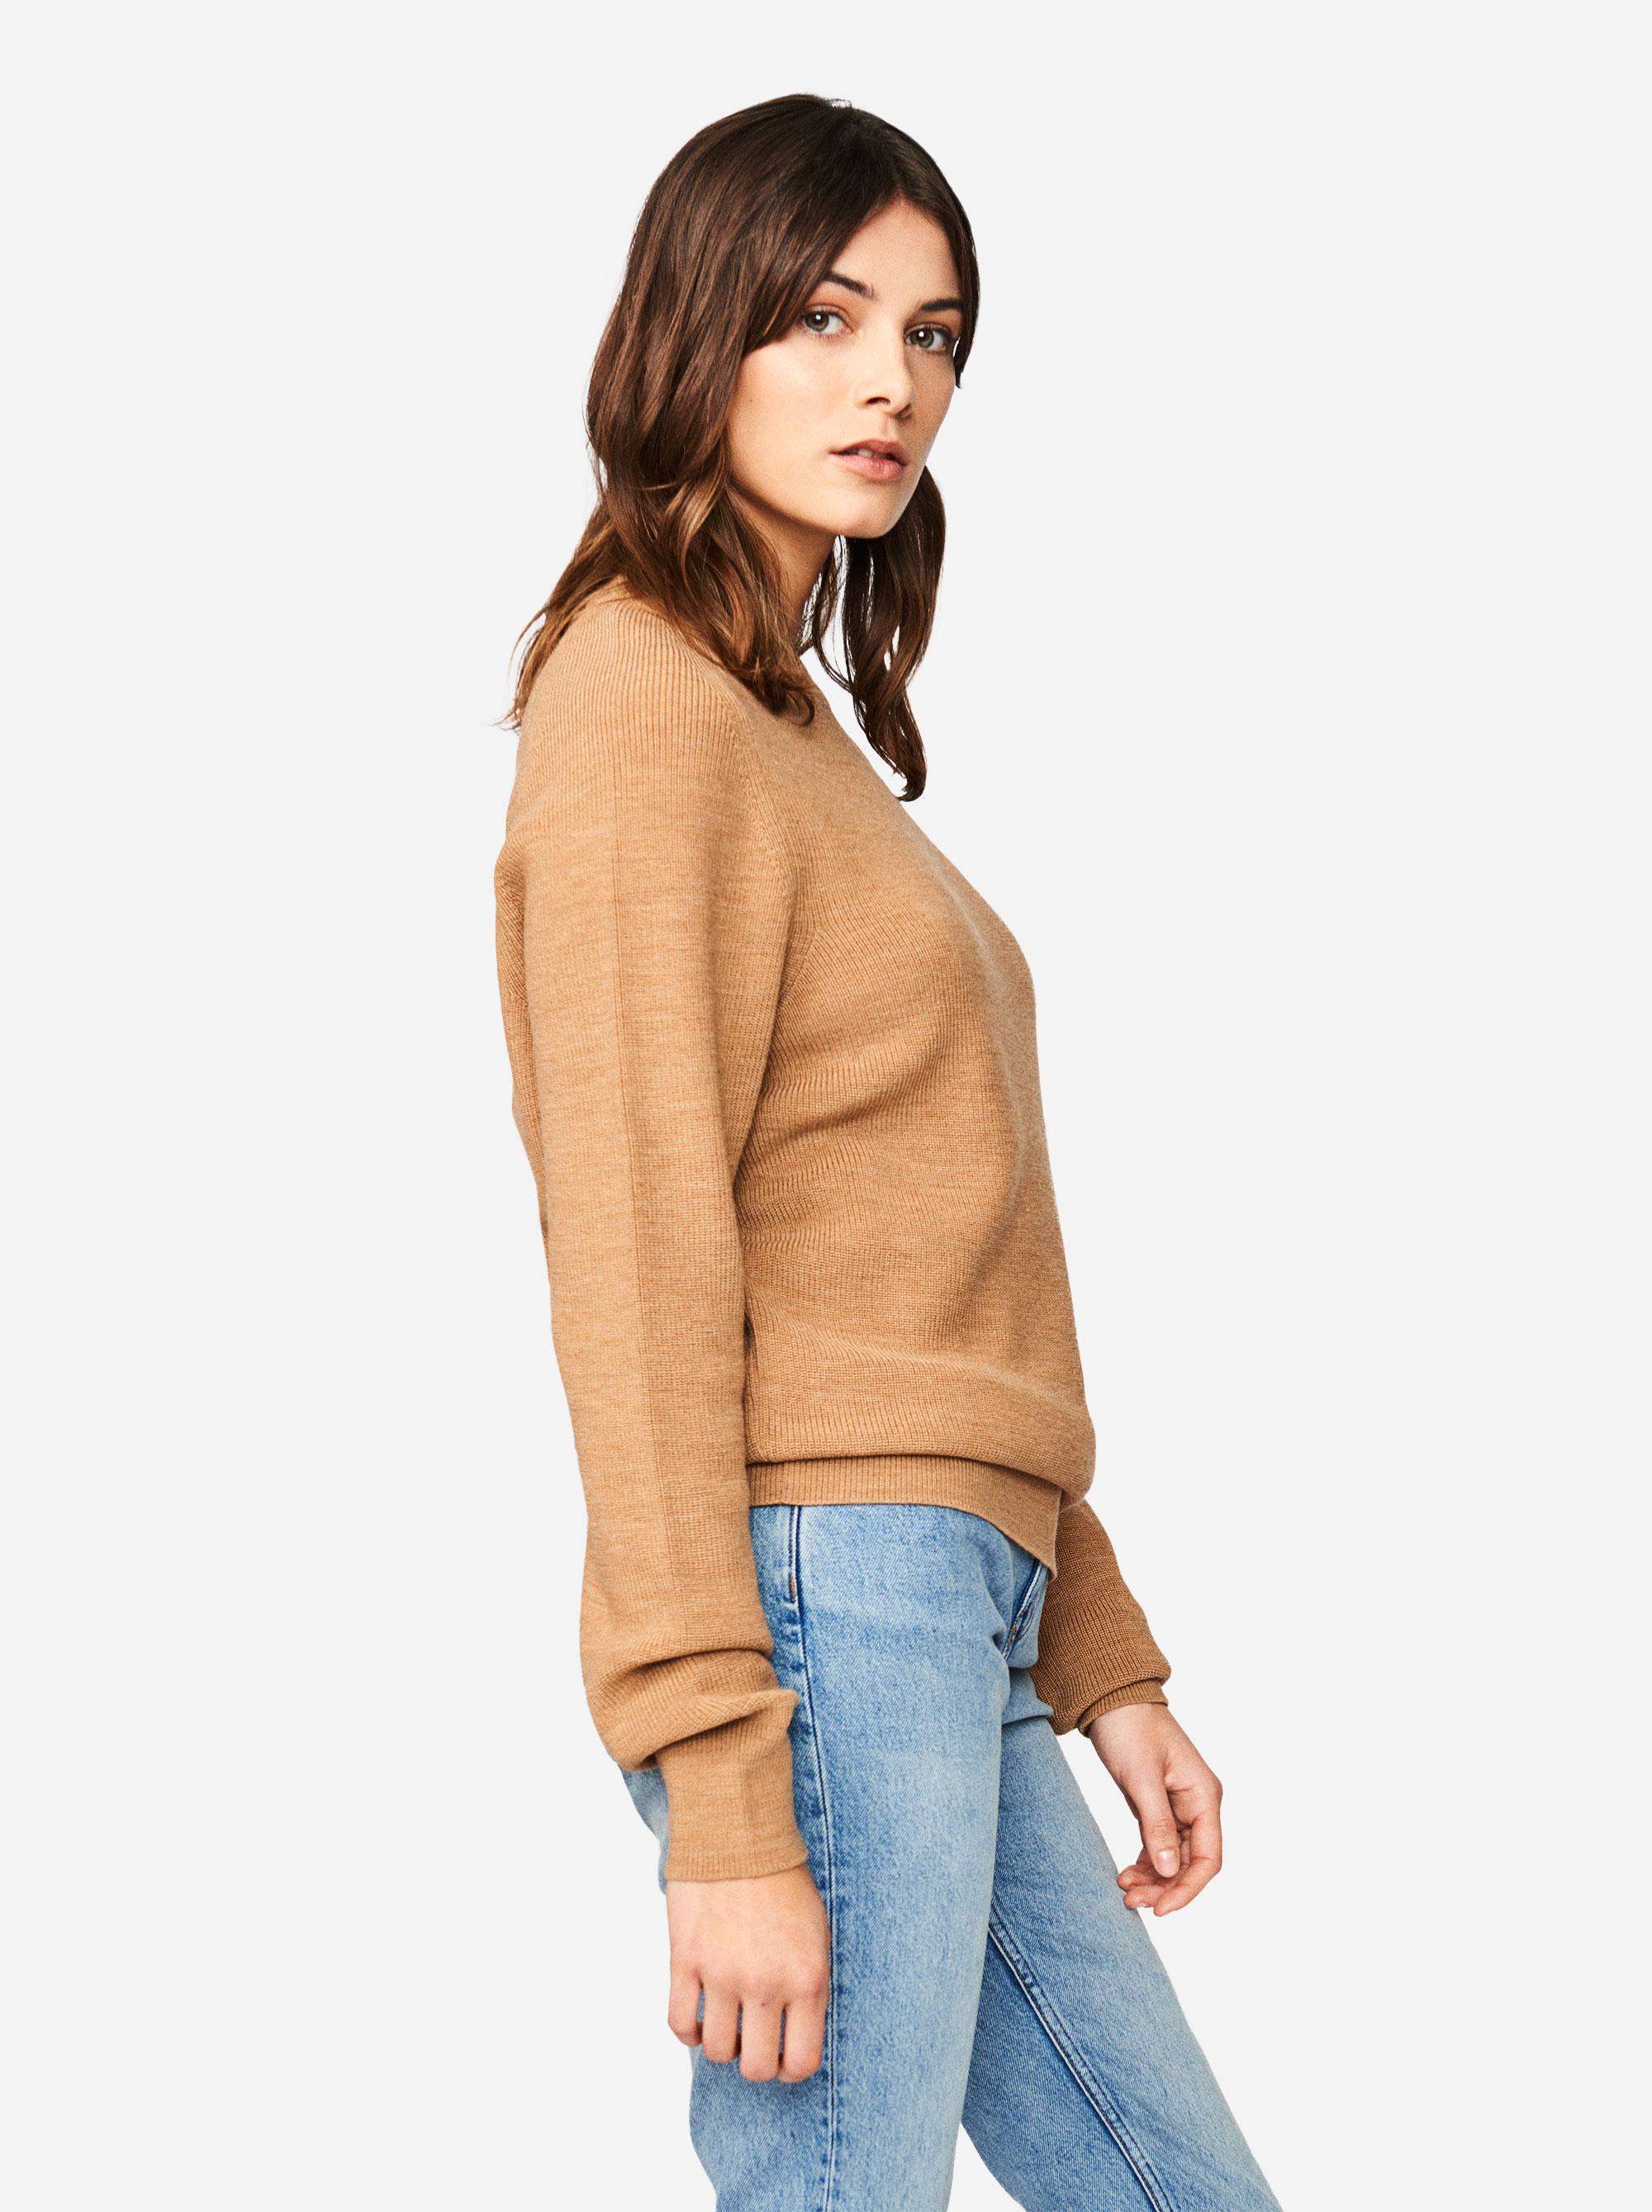 Teym - Crewneck - The Merino Sweater - Women - Camel - 1